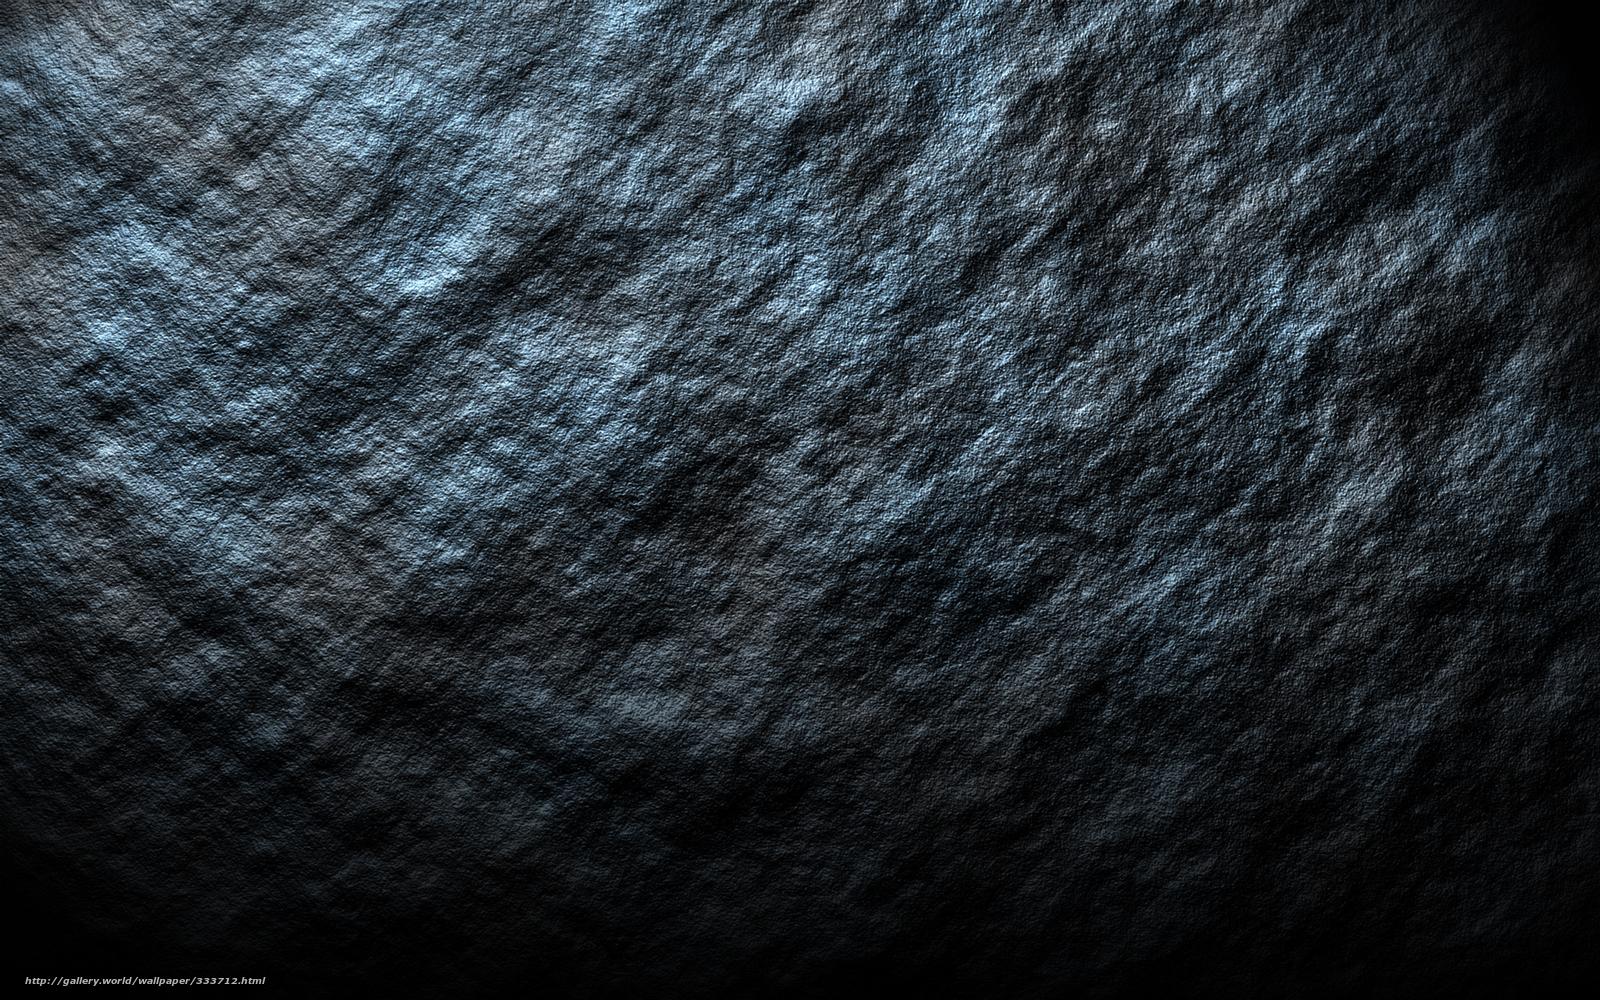 Download wallpaper stone block wall black desktop wallpaper in 1600x1000